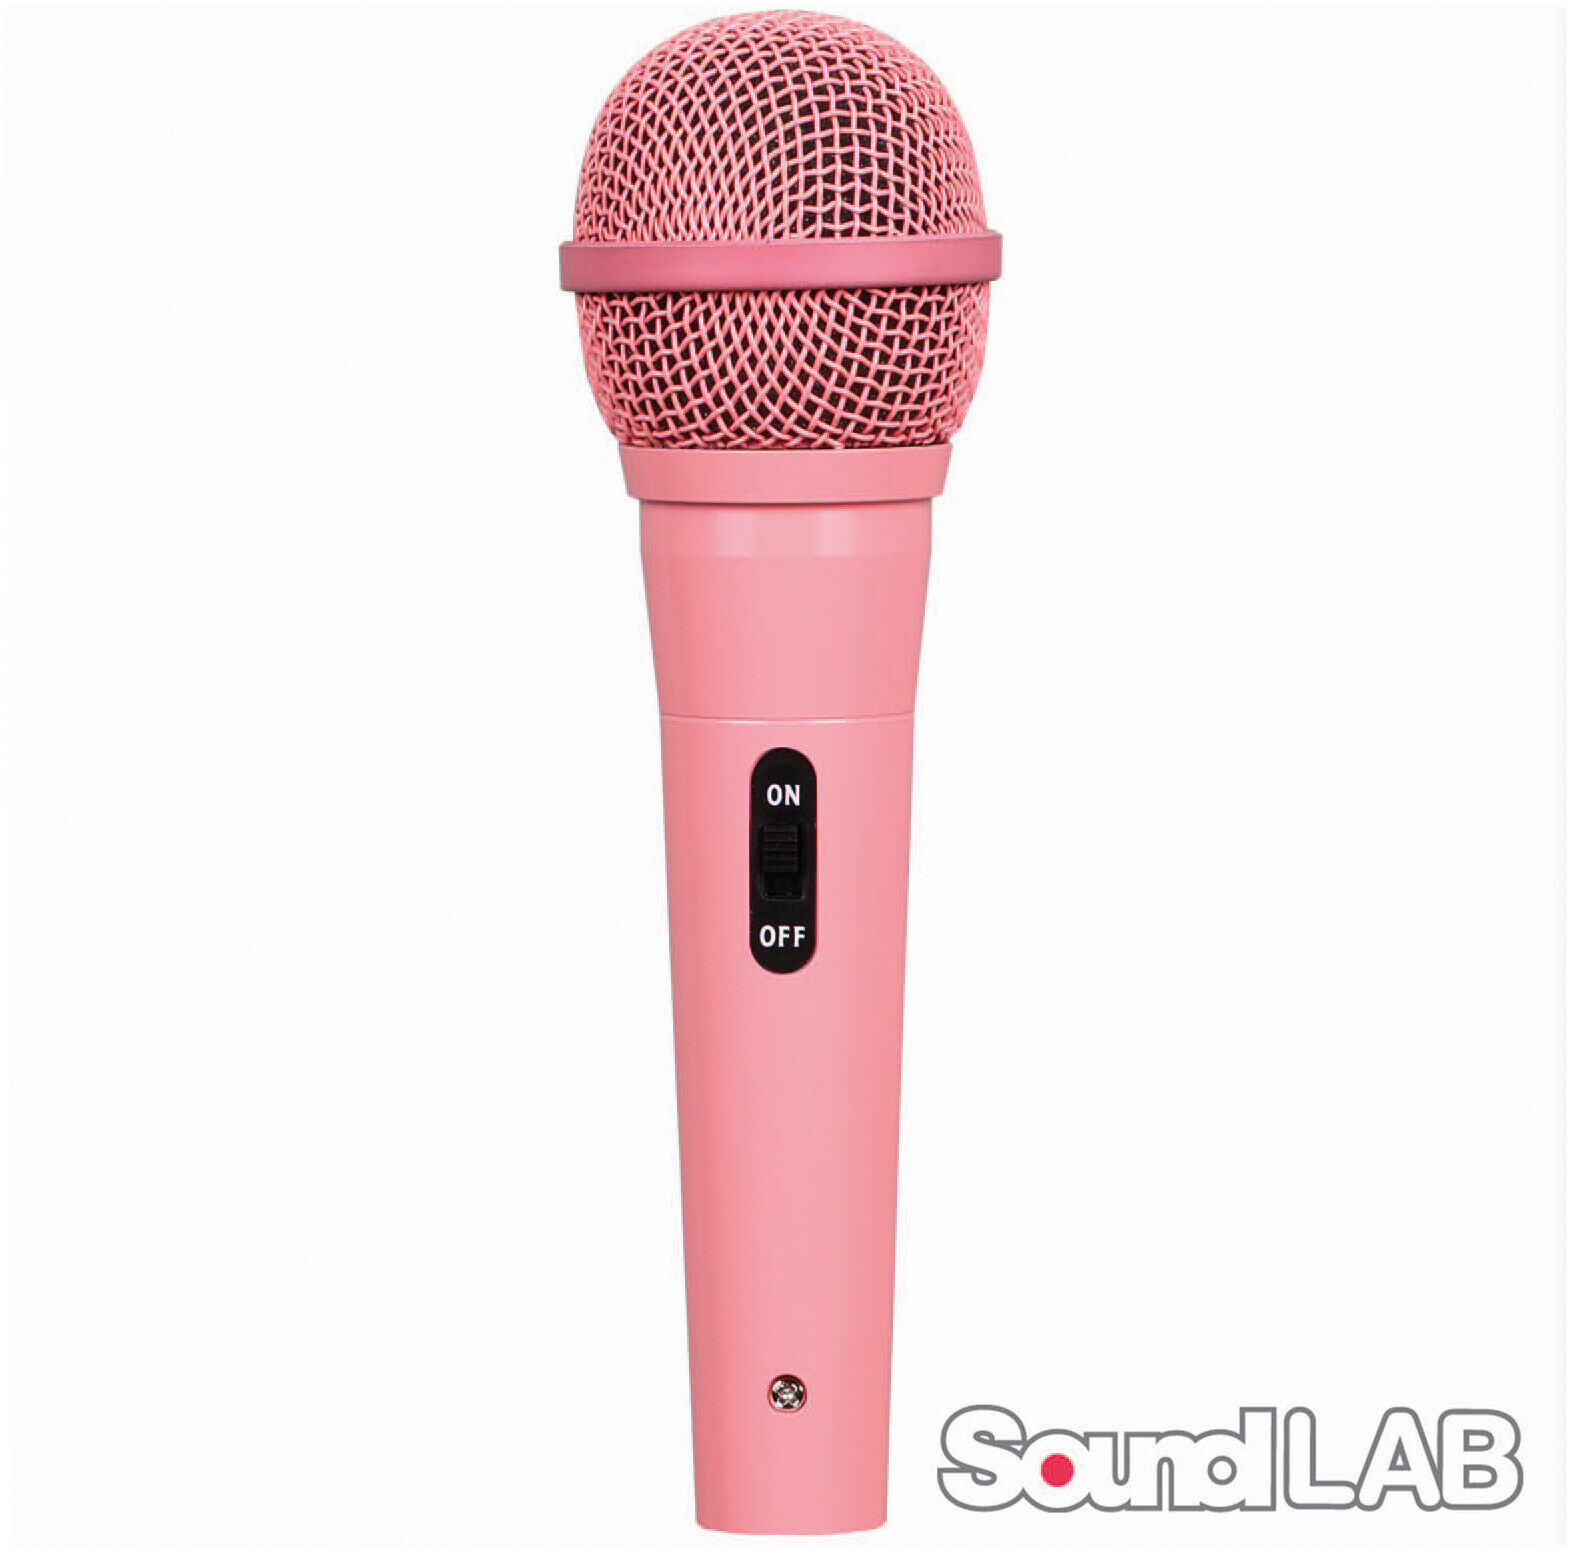 Soundlab G158MP dynamisches Mikrofon inkl Kabel 6,3mm Klinke Gesang Karaoke Pink